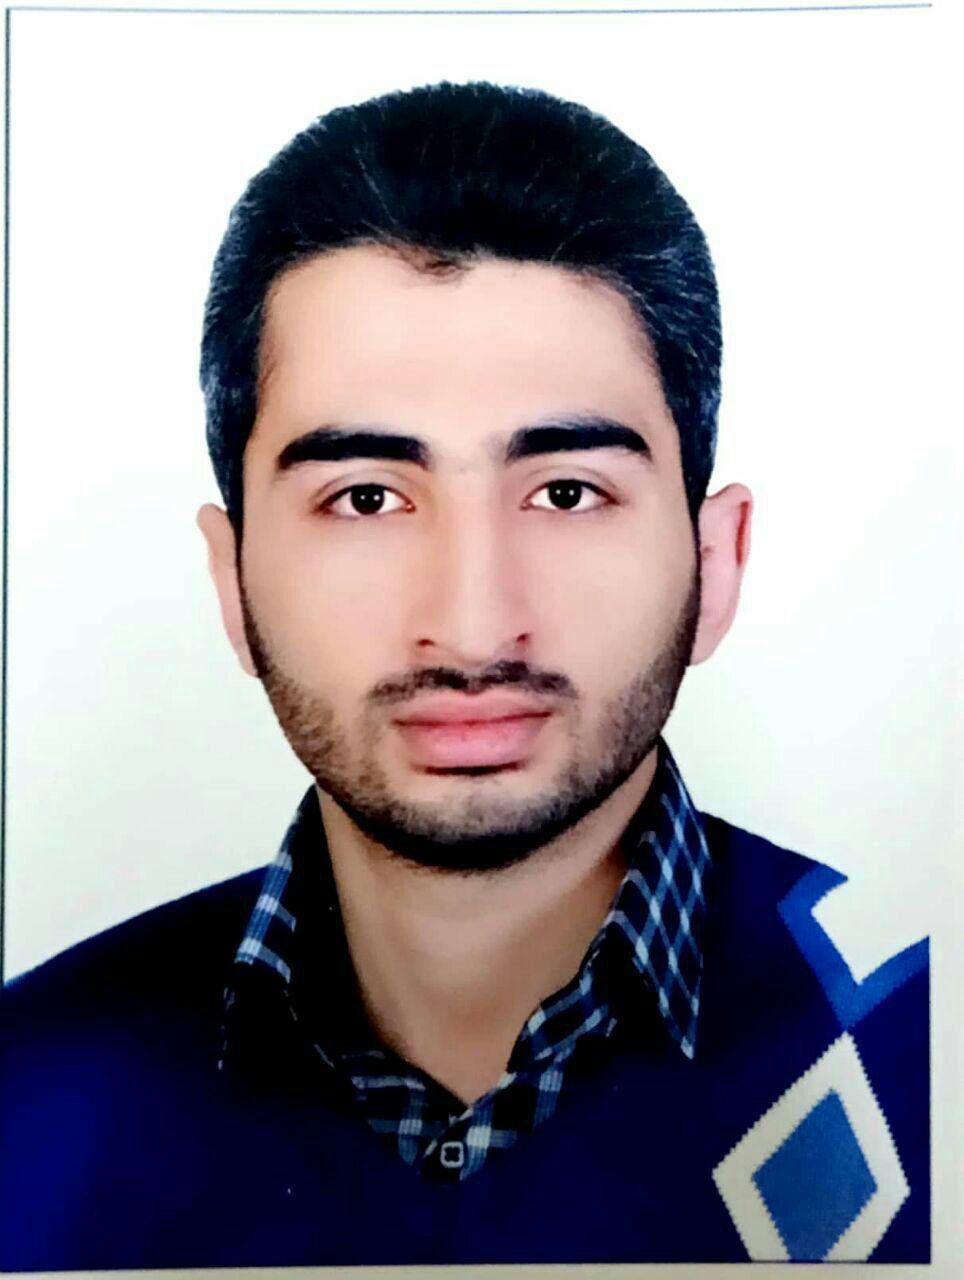 تصویر دکتر علیرضا درخشان